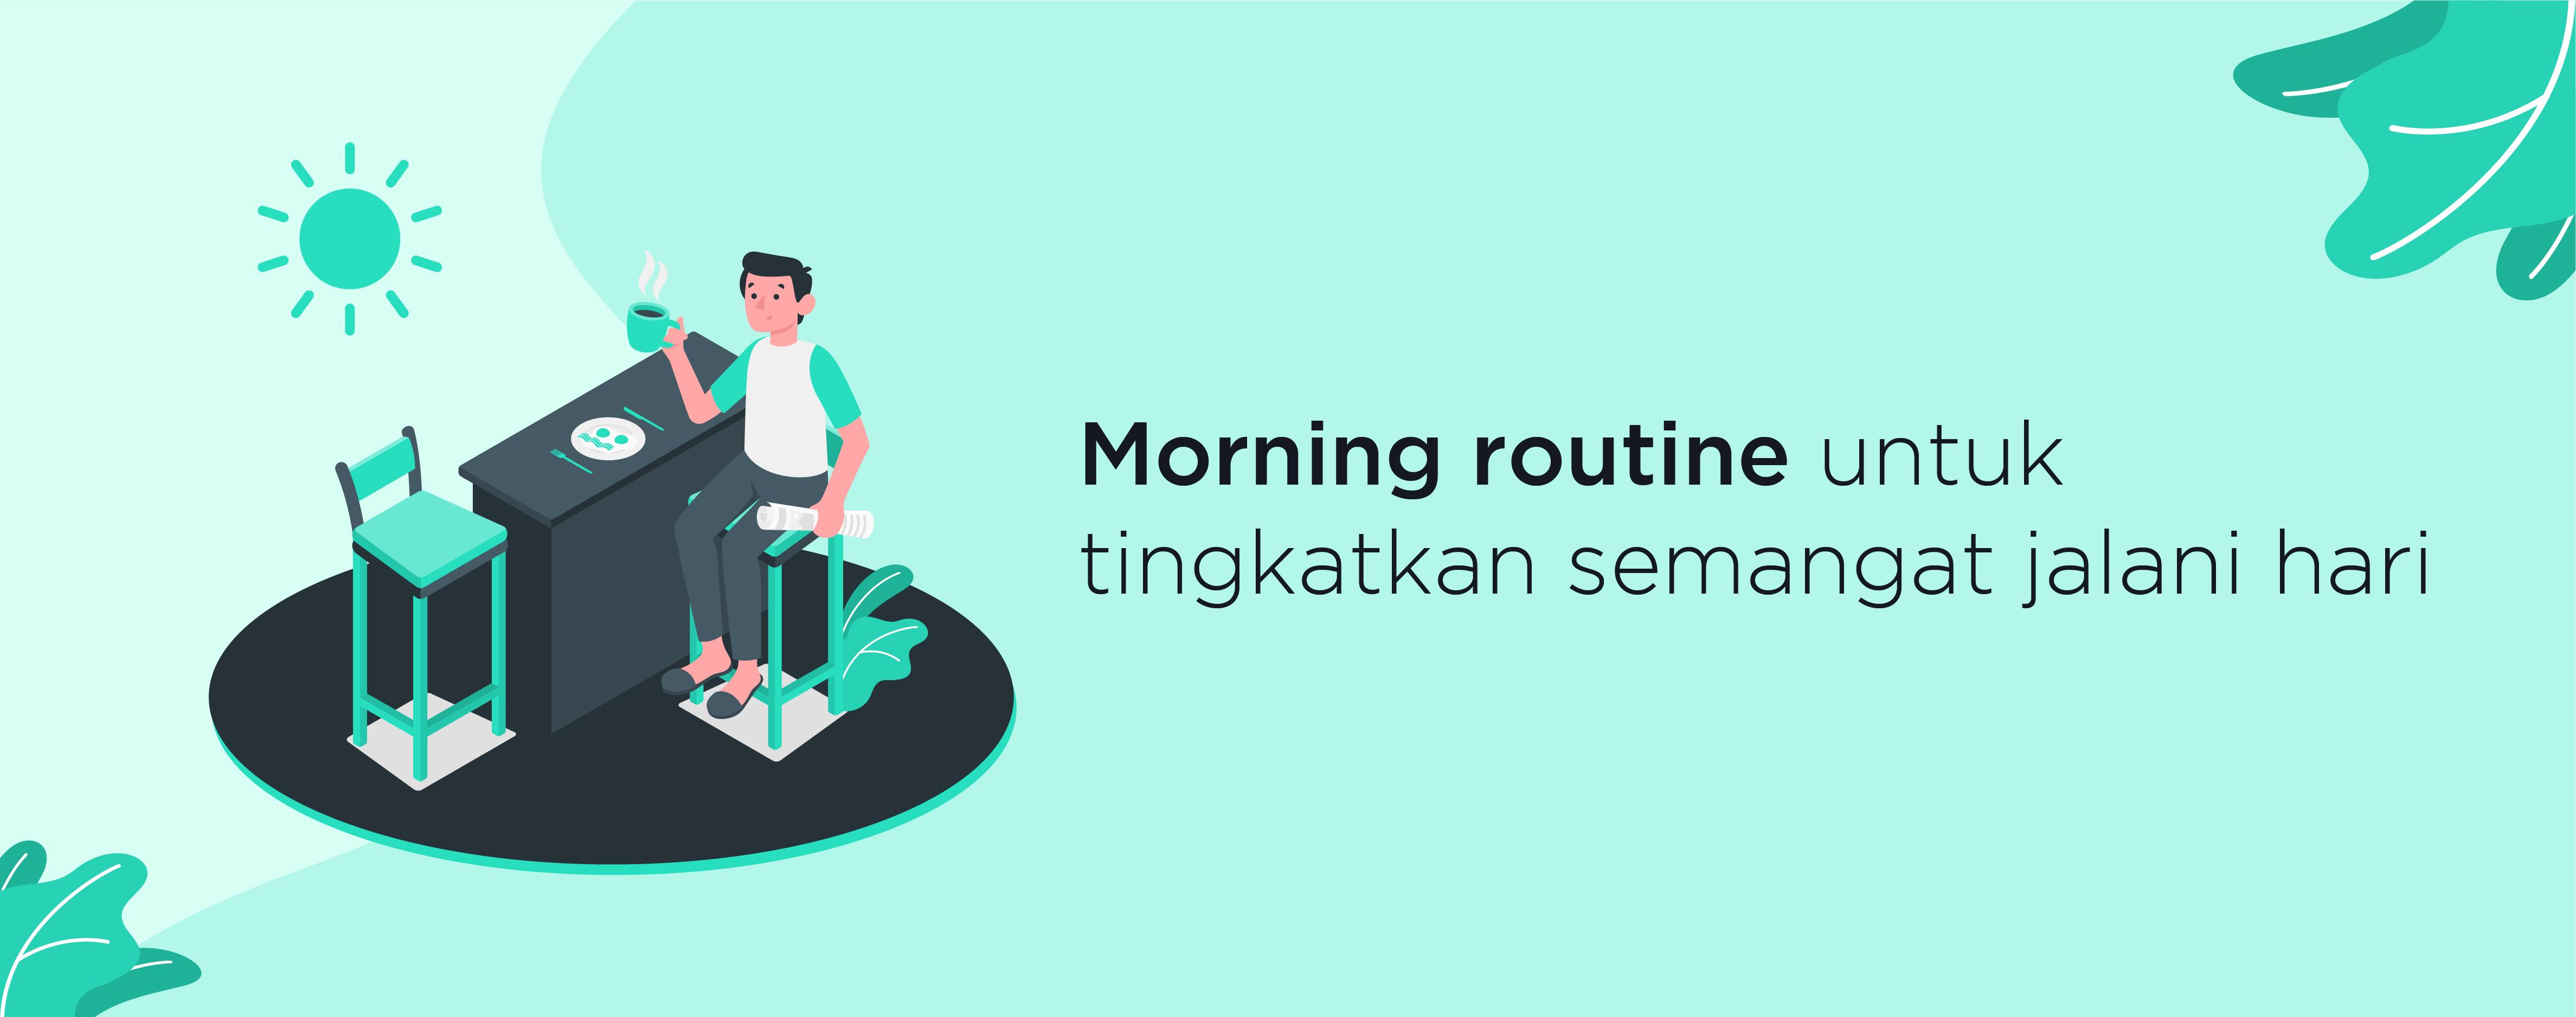 5 Morning Routine Untuk Tingkatkan Semangat Jalani Hari